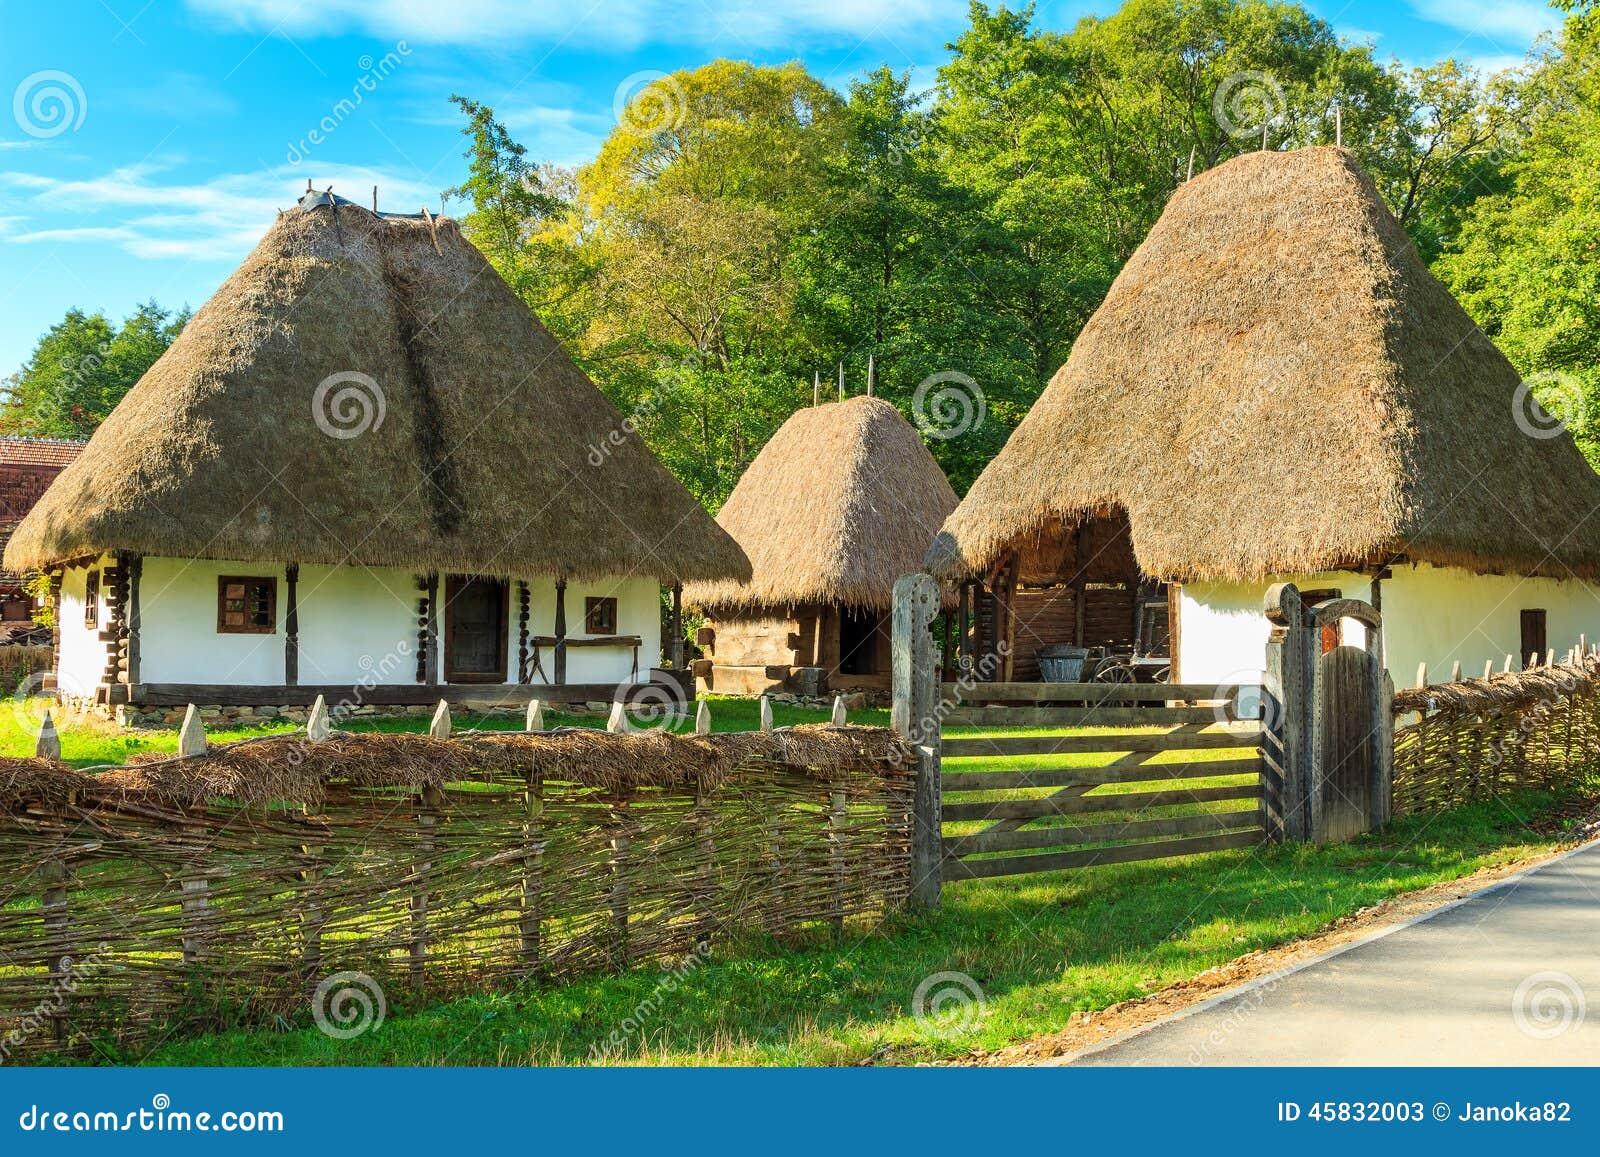 Typical peasant houses astra ethnographic village museum sibiu romania europe stock photo - Romanian peasant houses ...